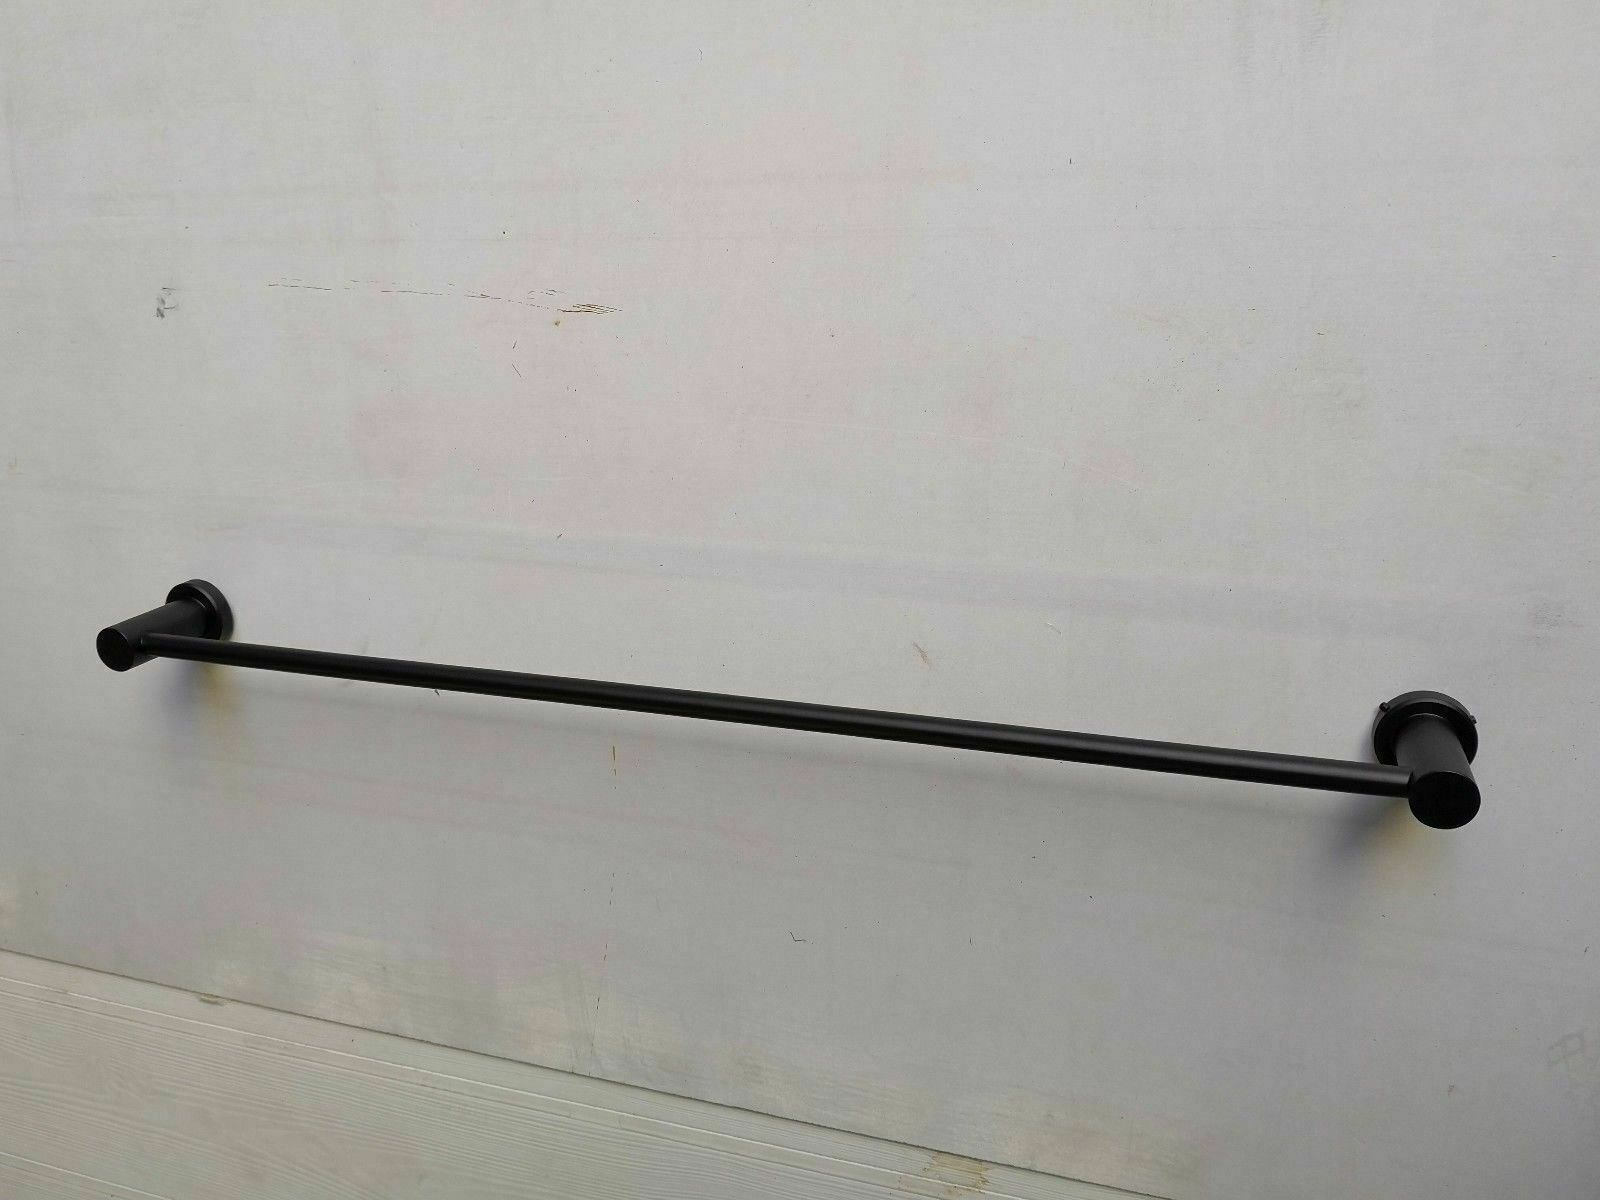 Matte Black hard wired Heated Towel Rail rack Round AU standard SINGLE bar 850mm